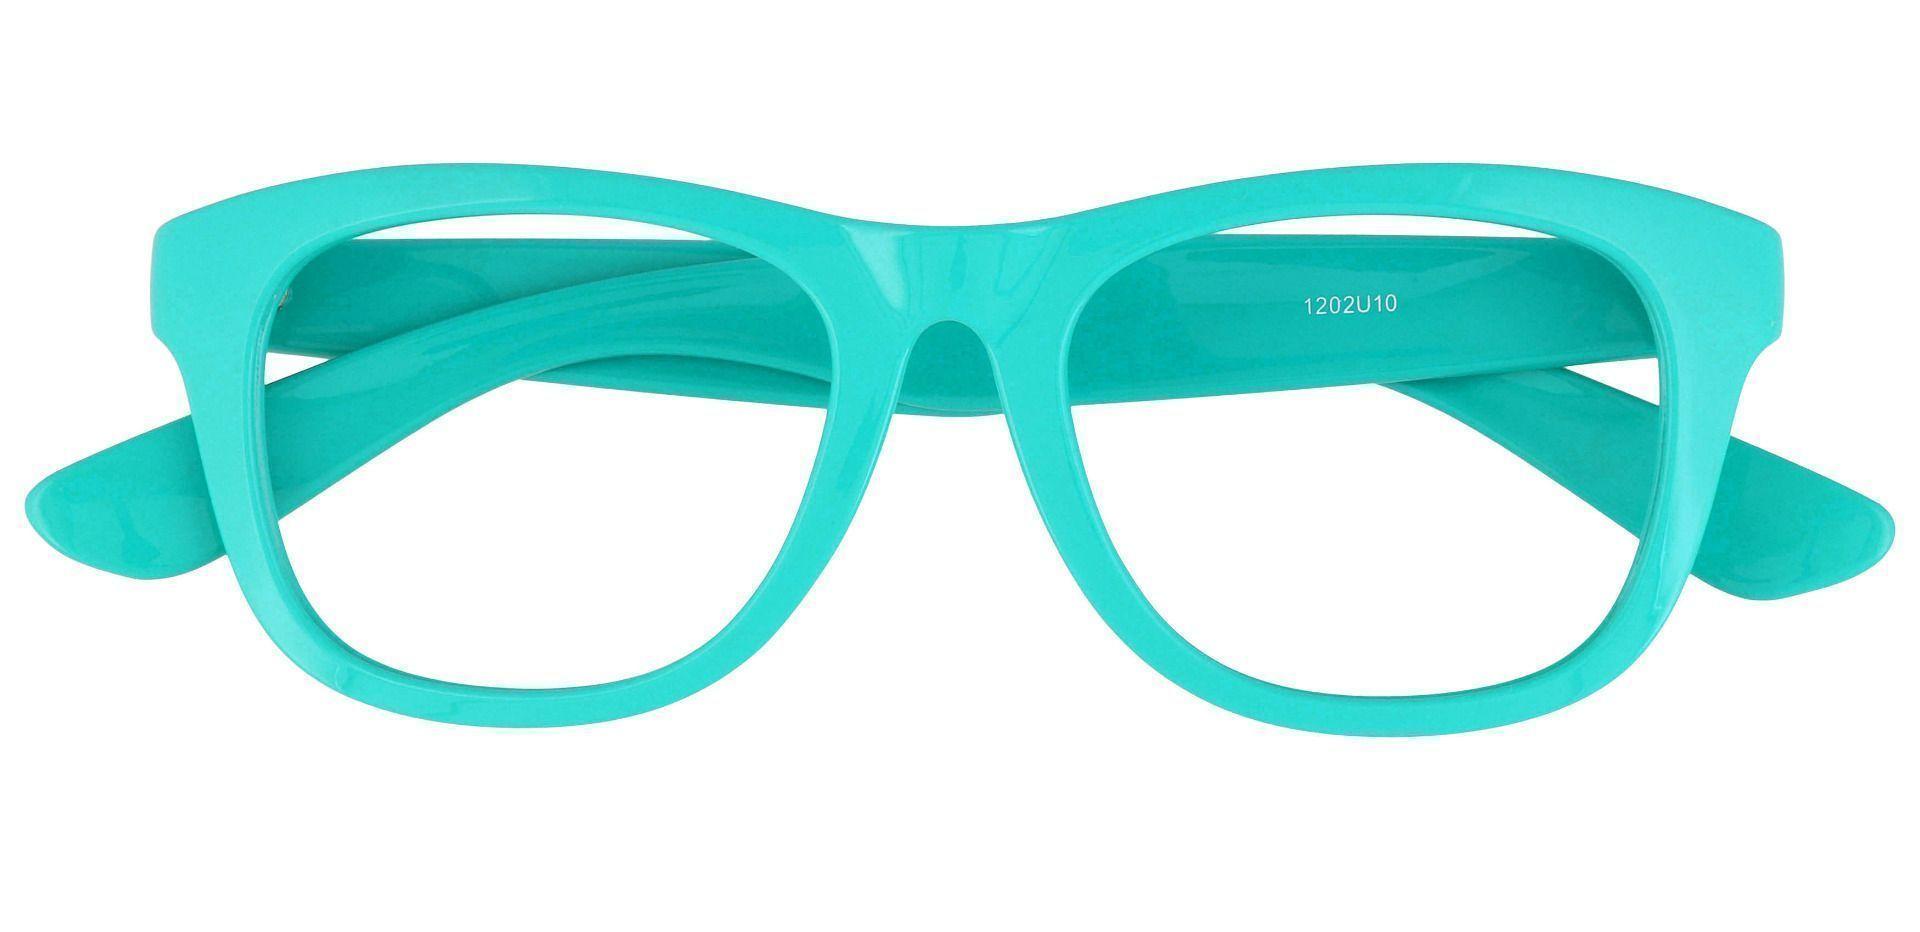 Callie Square Eyeglasses Frame - Blue